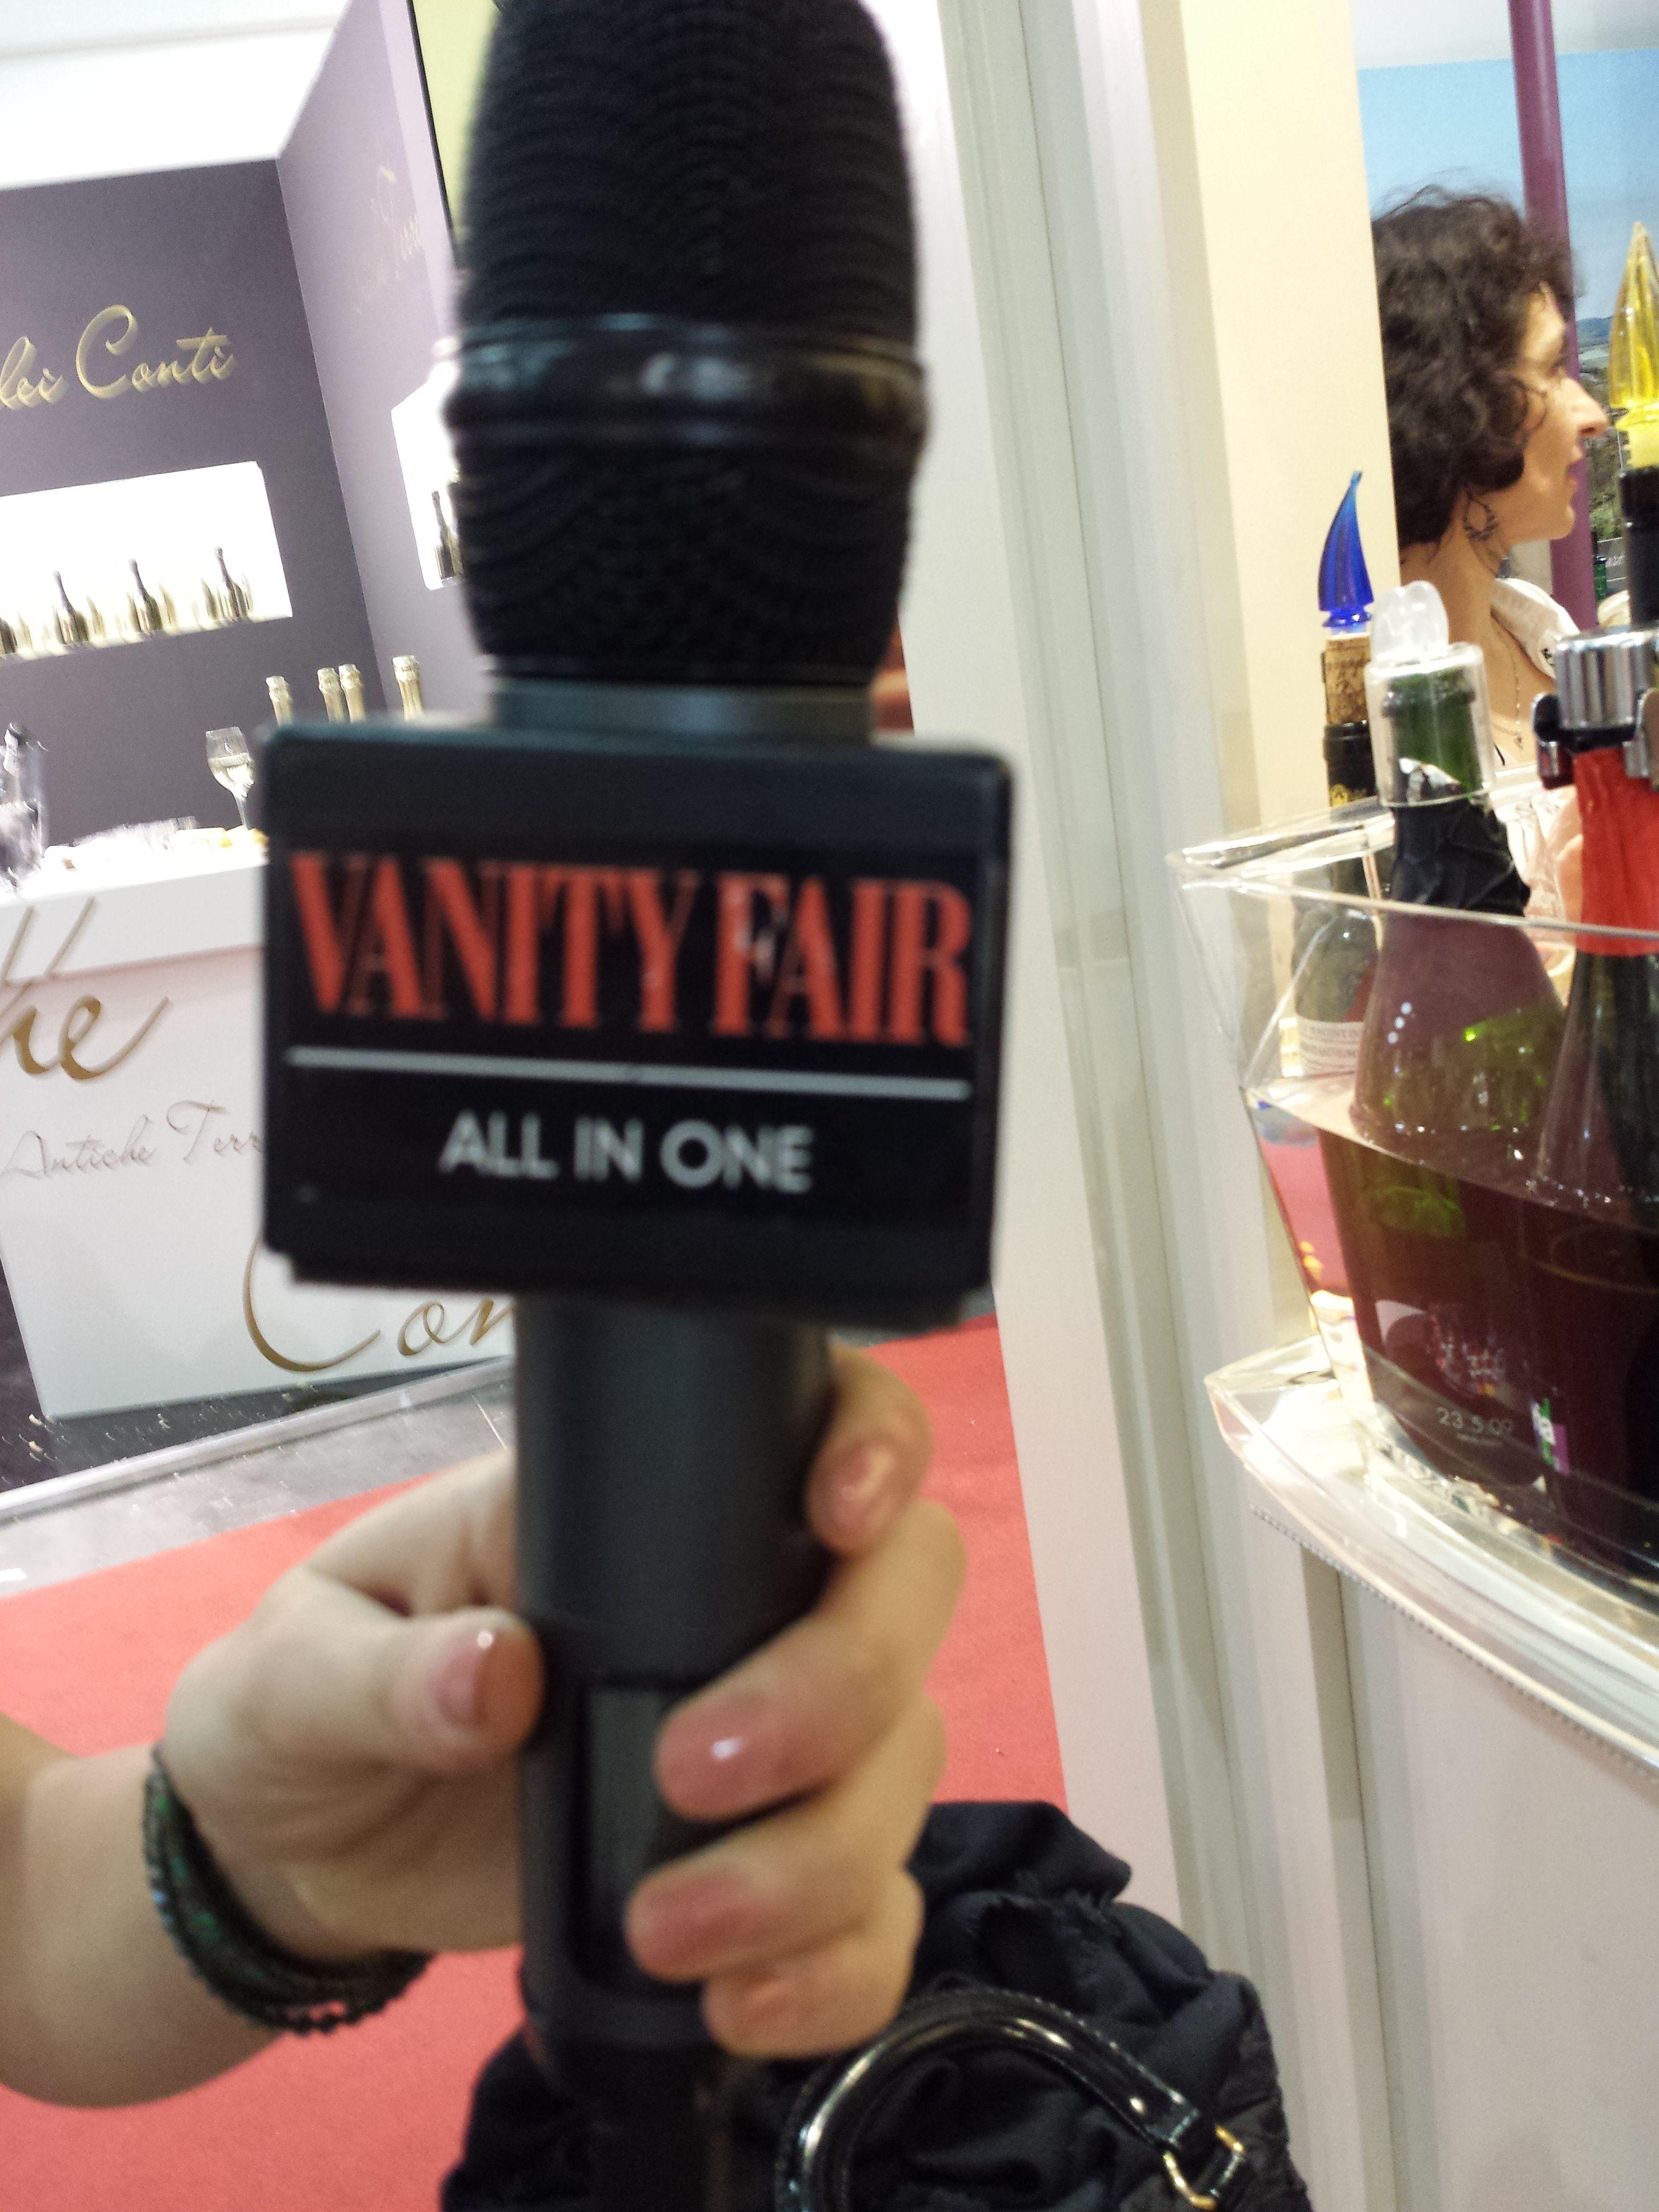 Siamo All-in-one..su Vanity Fair. Special Guest @Silvia Vietri #vinitaly2015 #lacantinadipaul #woodandwine #campofal #silviavietri